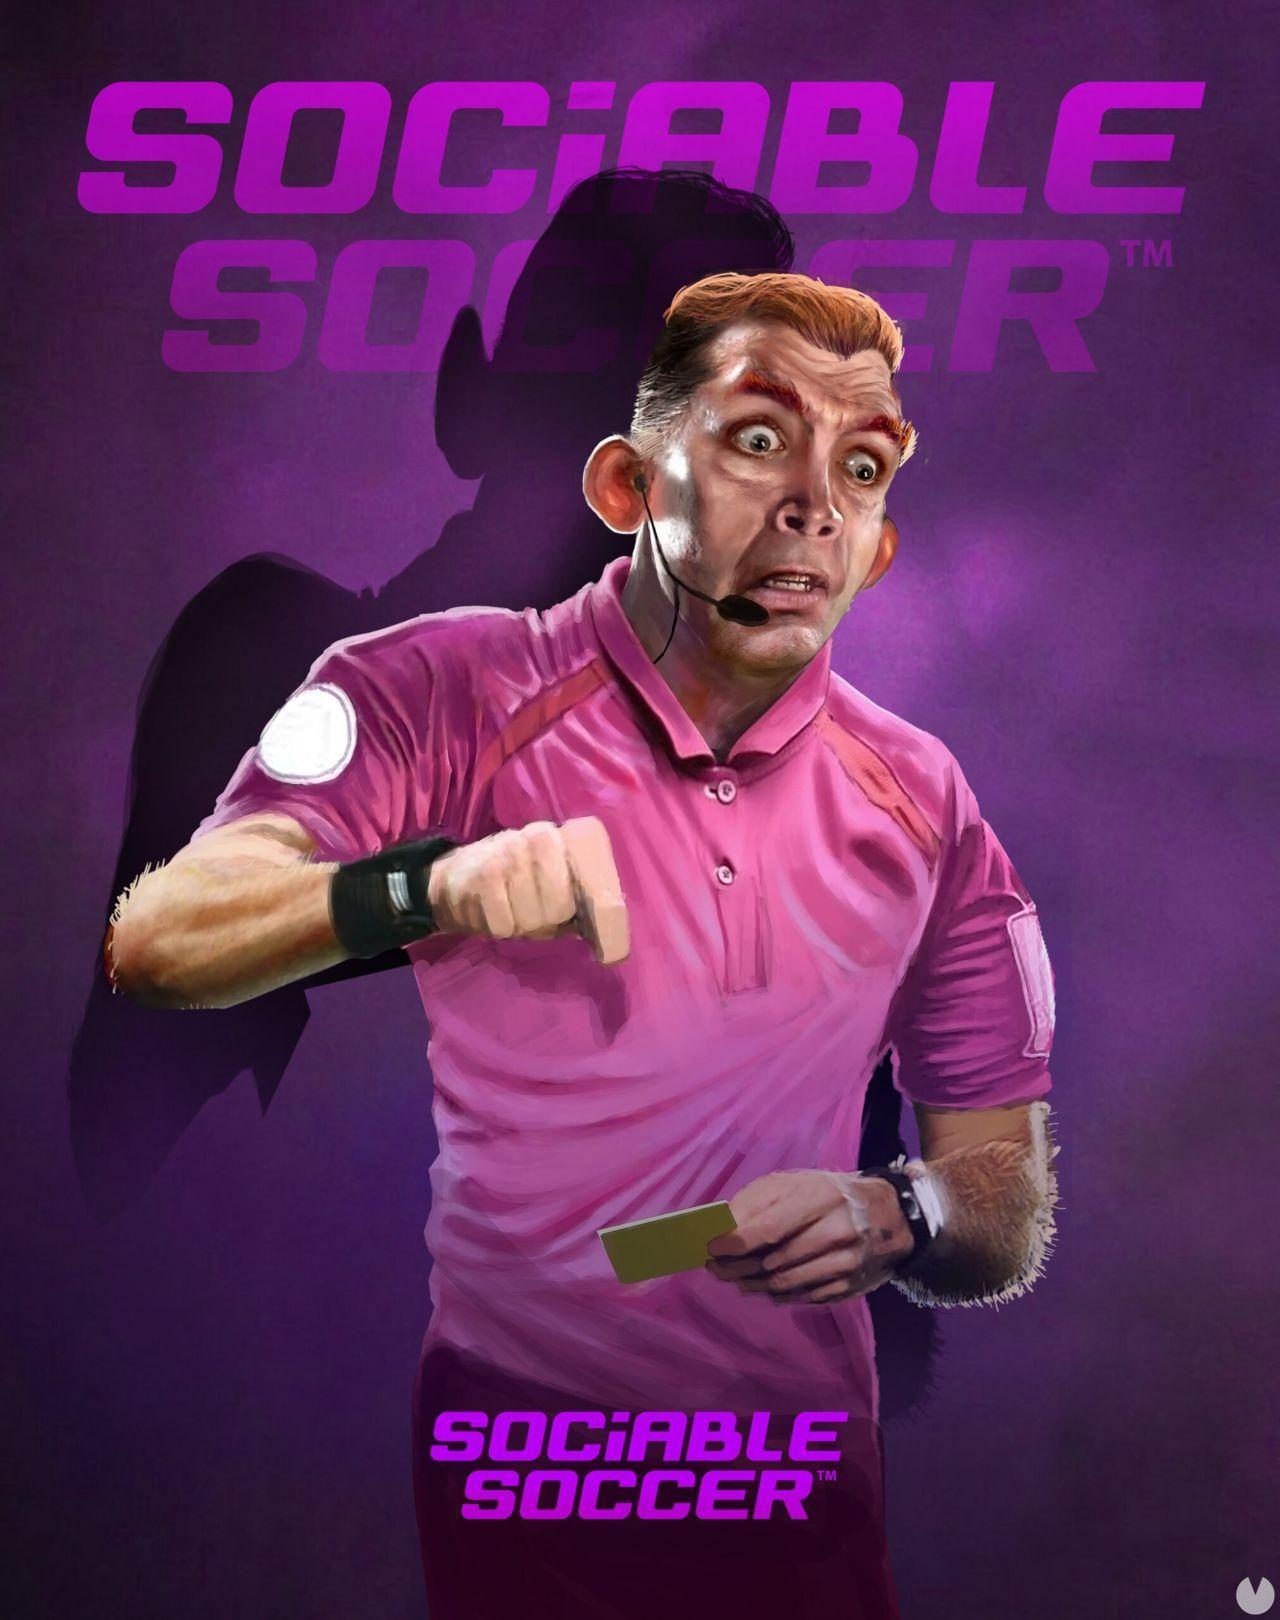 Sociable Soccer, sucesor de Sensible Soccer, llega a consolas y PC en abril de 2022